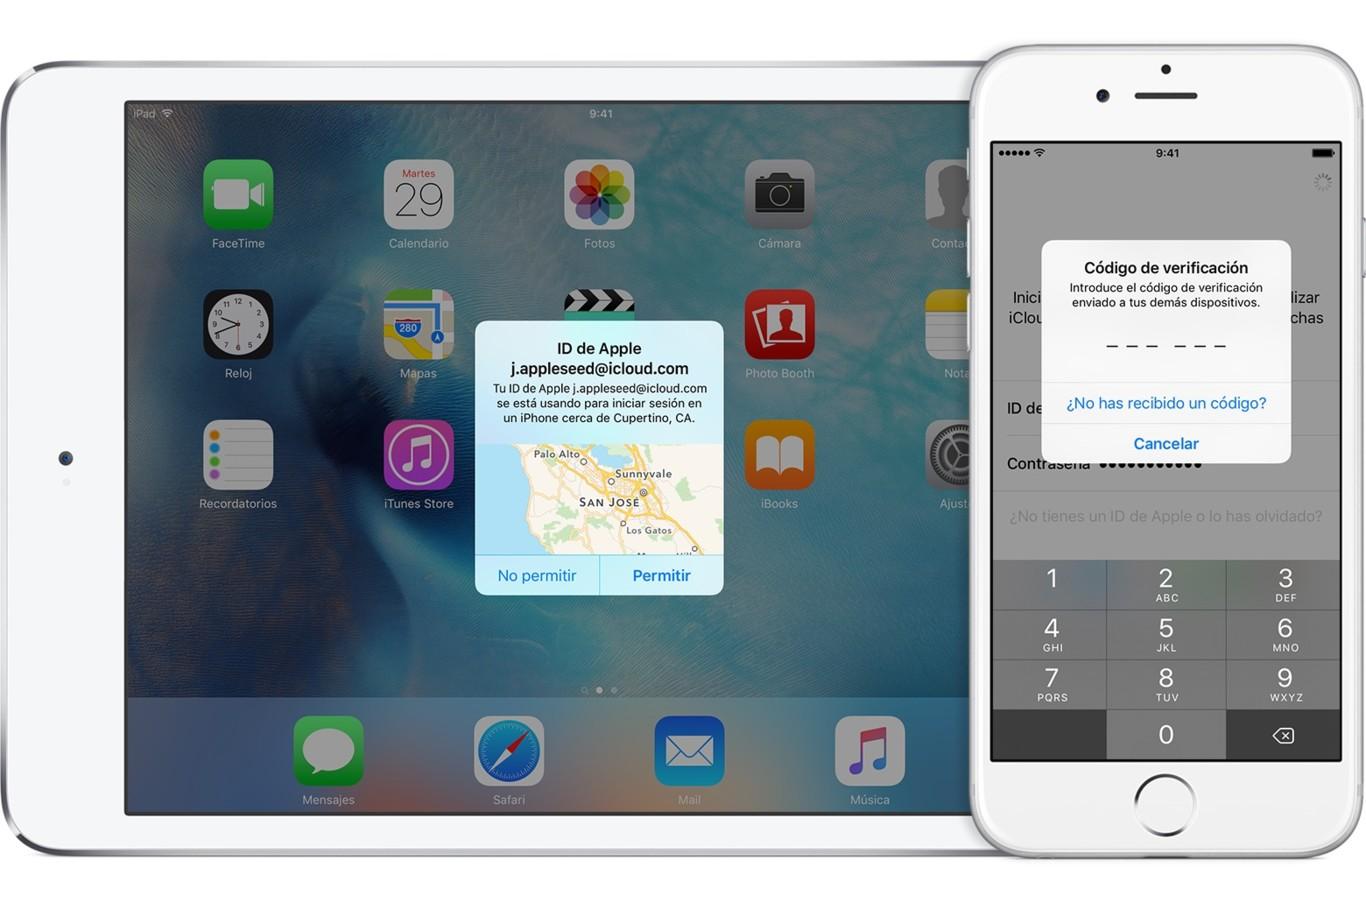 Apple Id Two Factor Verification Hero